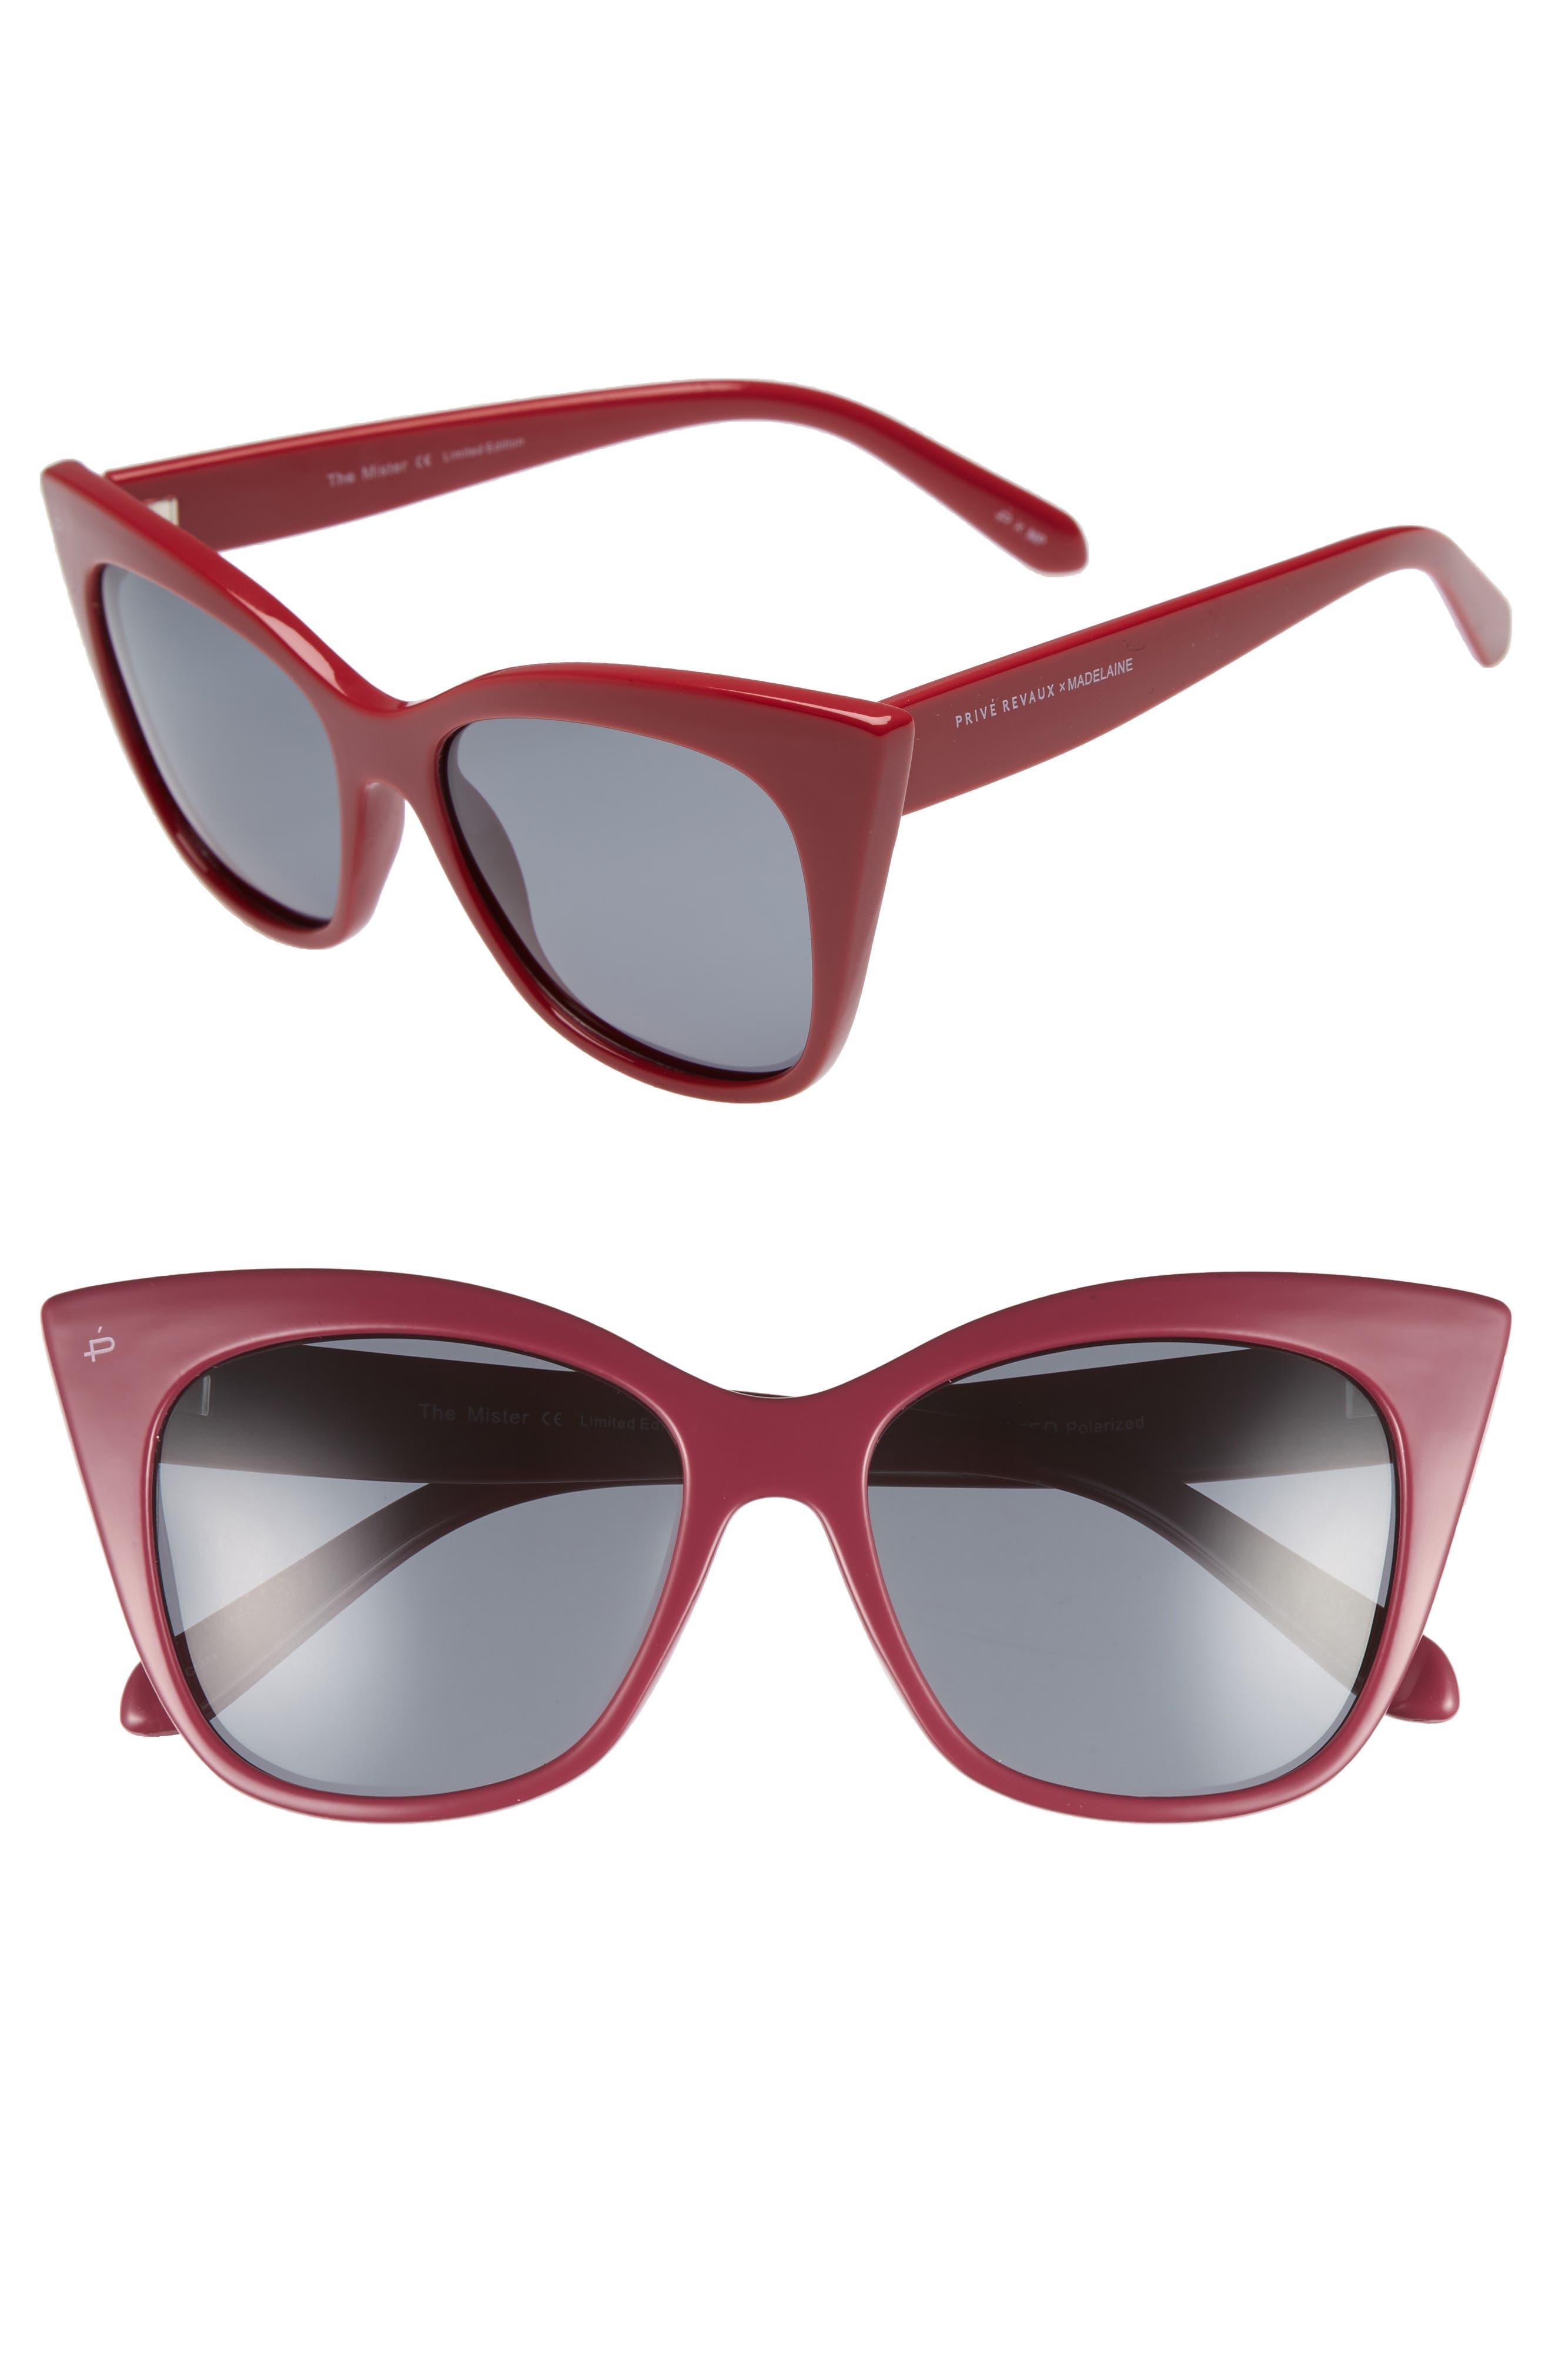 Privé Revaux x Madelaine Petsch The Mister 54mm Cat Eye Sunglasses,                             Main thumbnail 1, color,                             Red/ Black